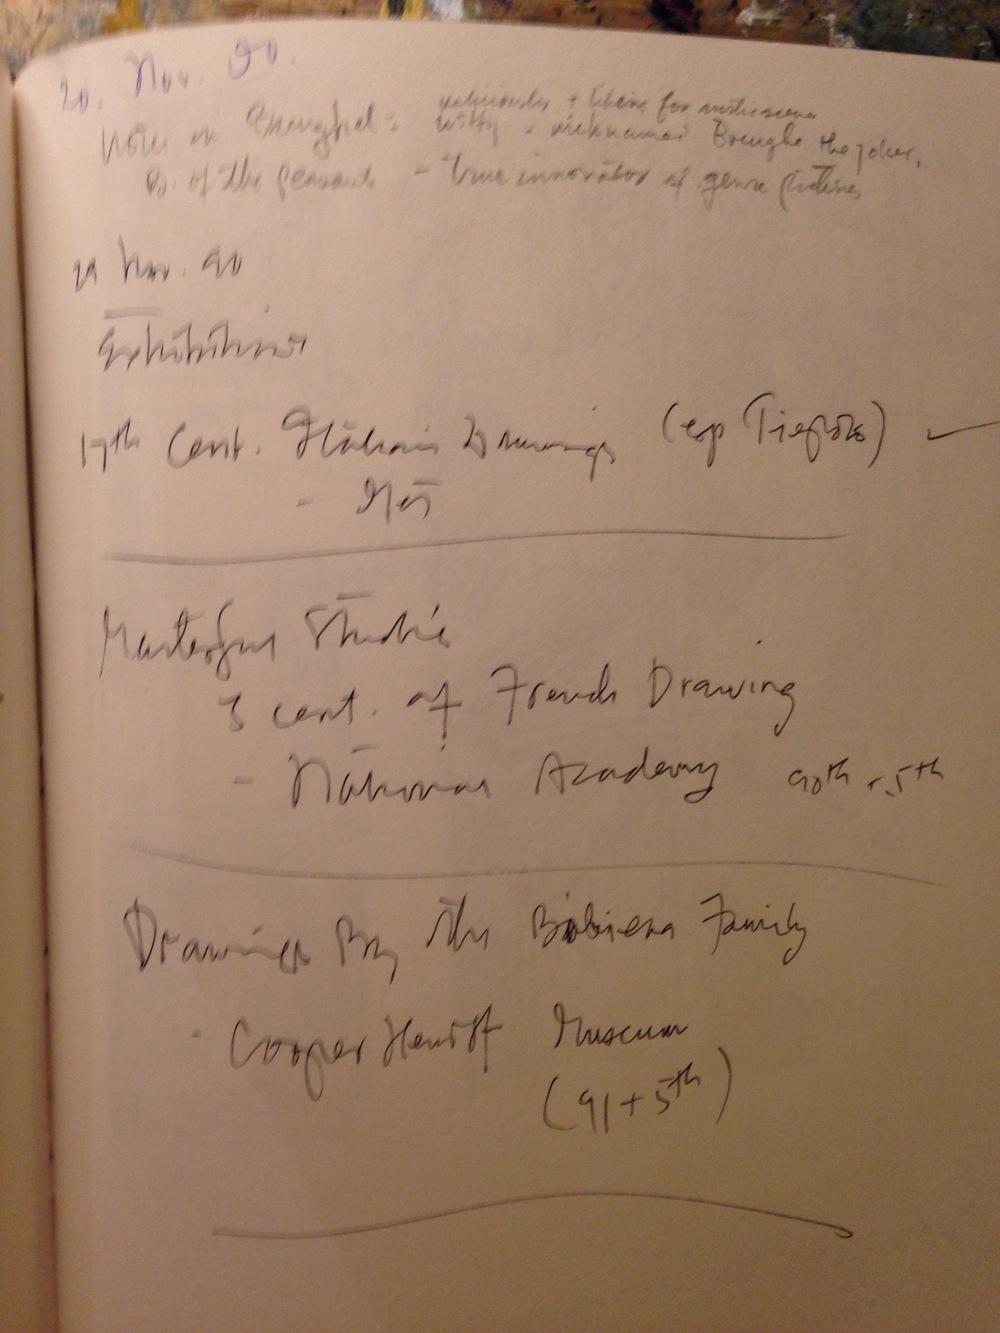 Exhibits I went to see, November 1990. New York City.